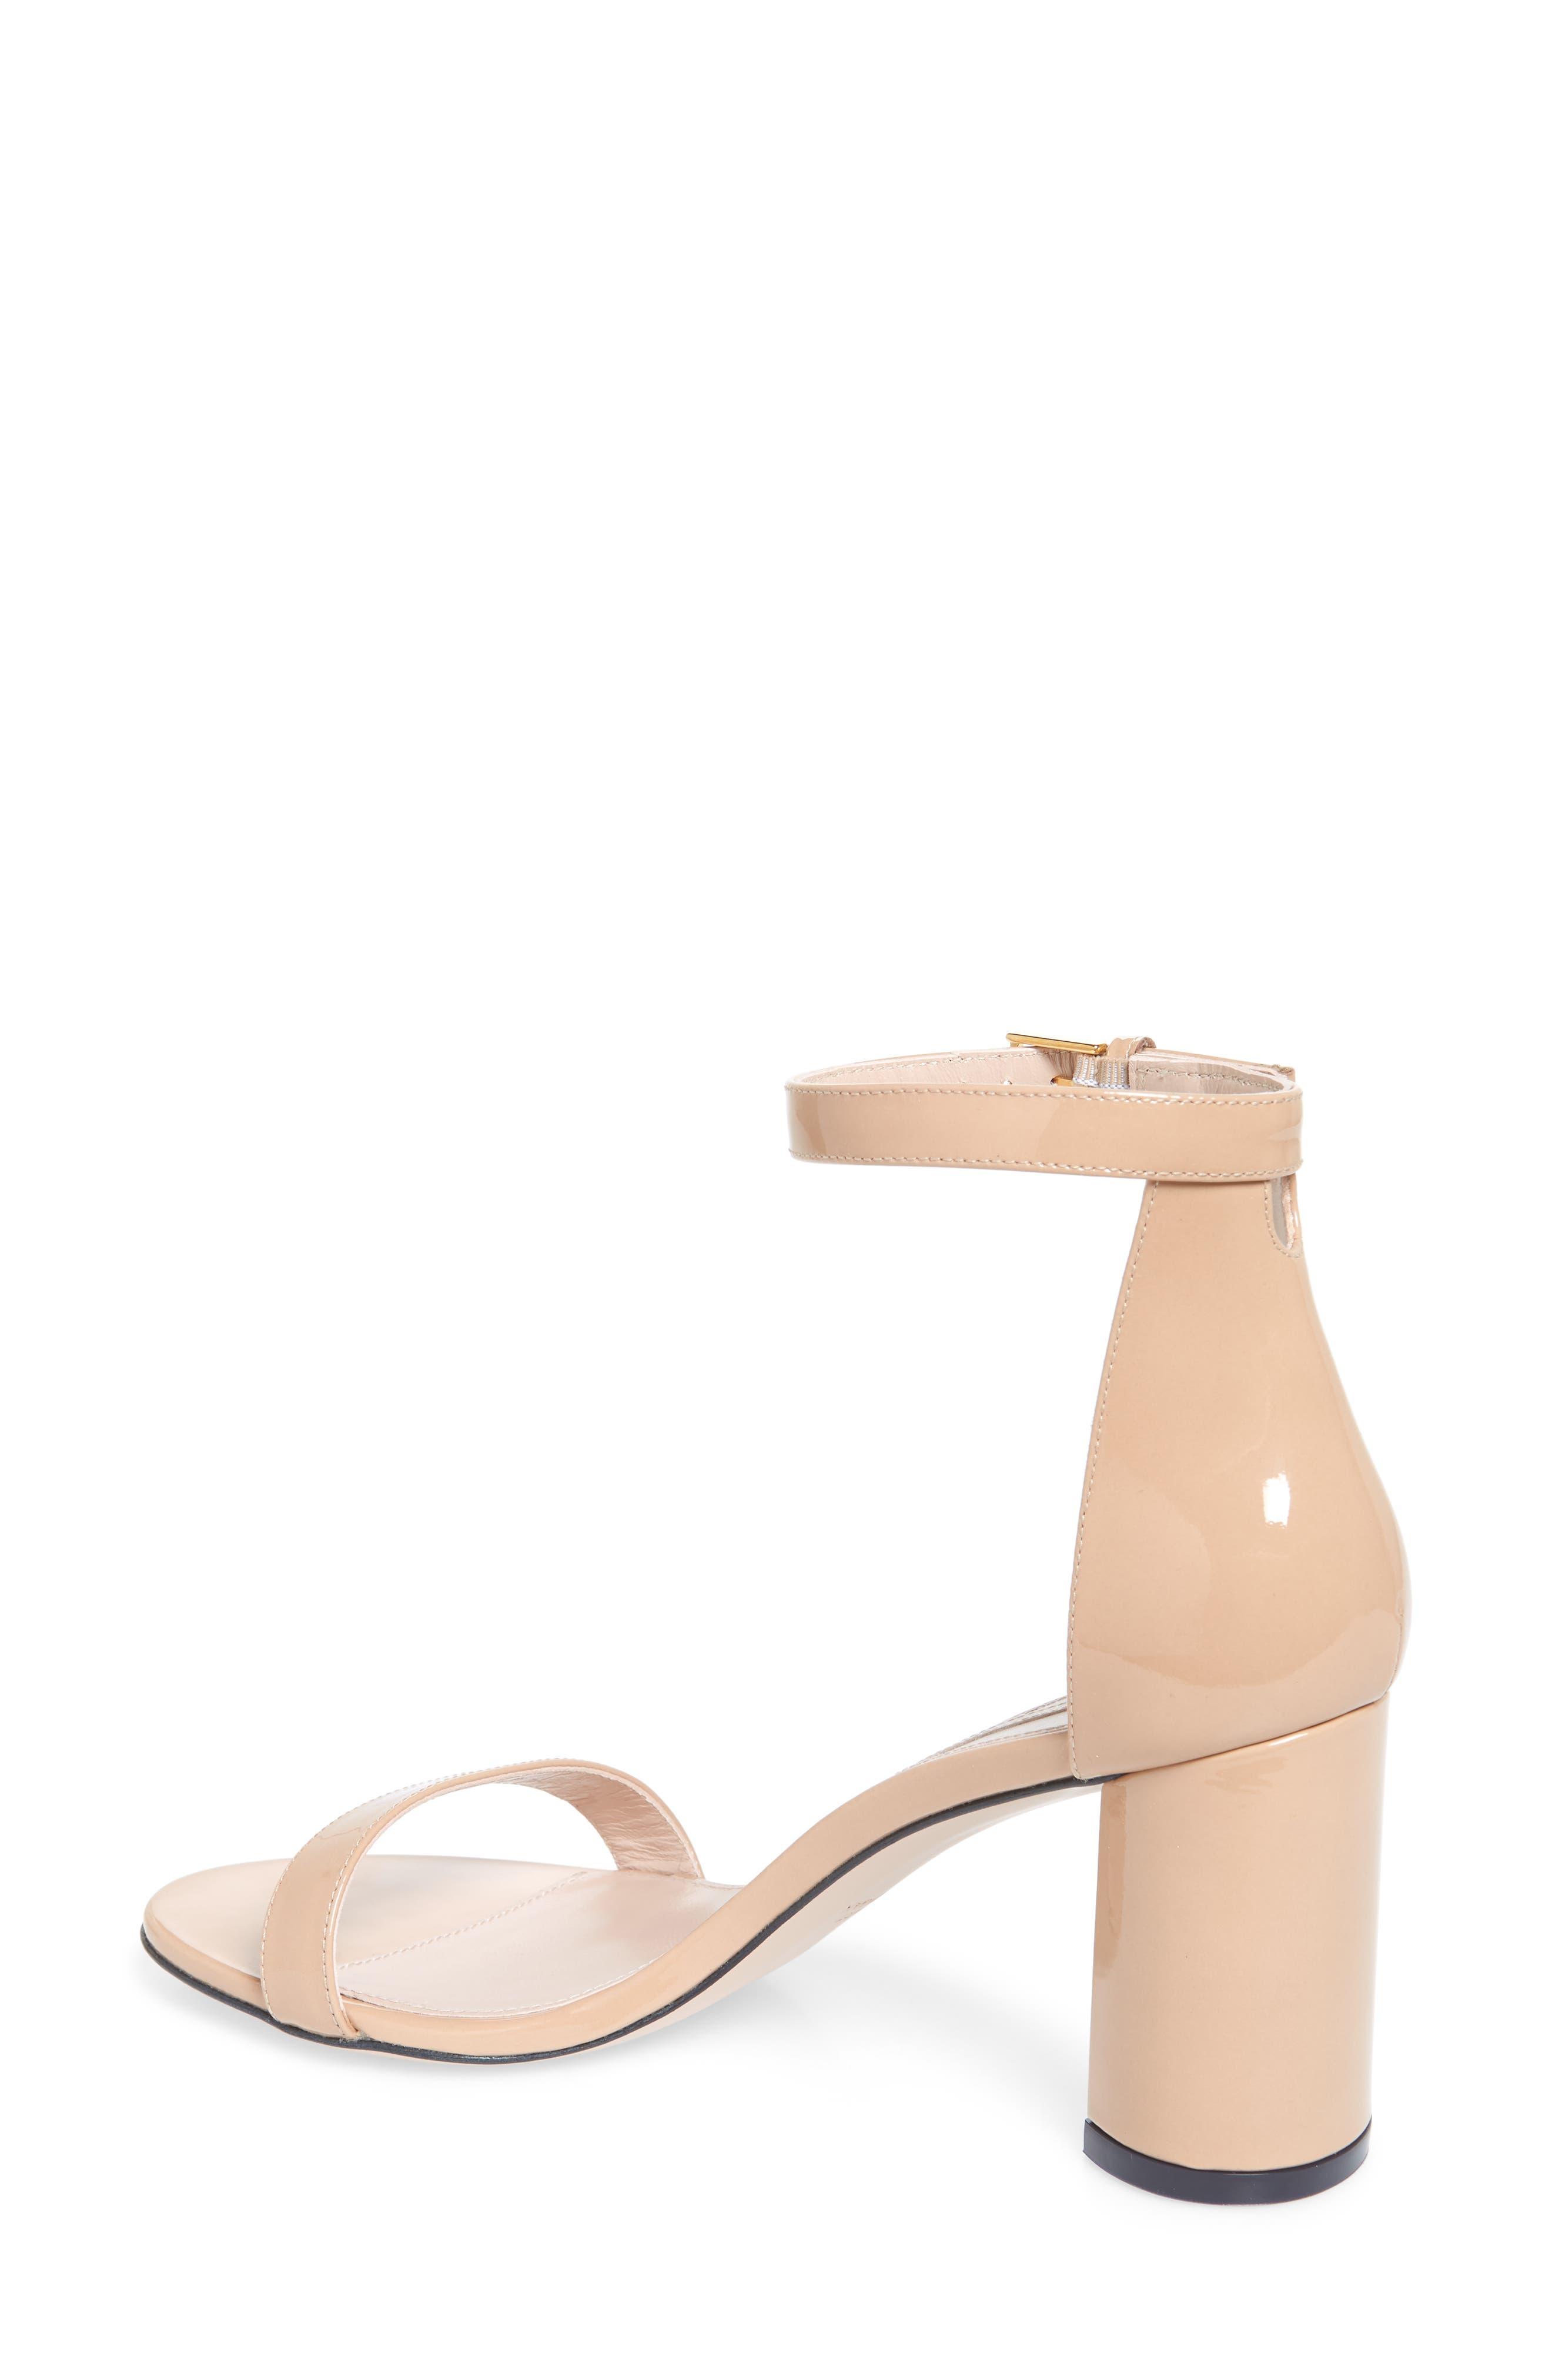 75LESSNUDIST Ankle Strap Sandal,                             Alternate thumbnail 2, color,                             ADOBE CRISTAL